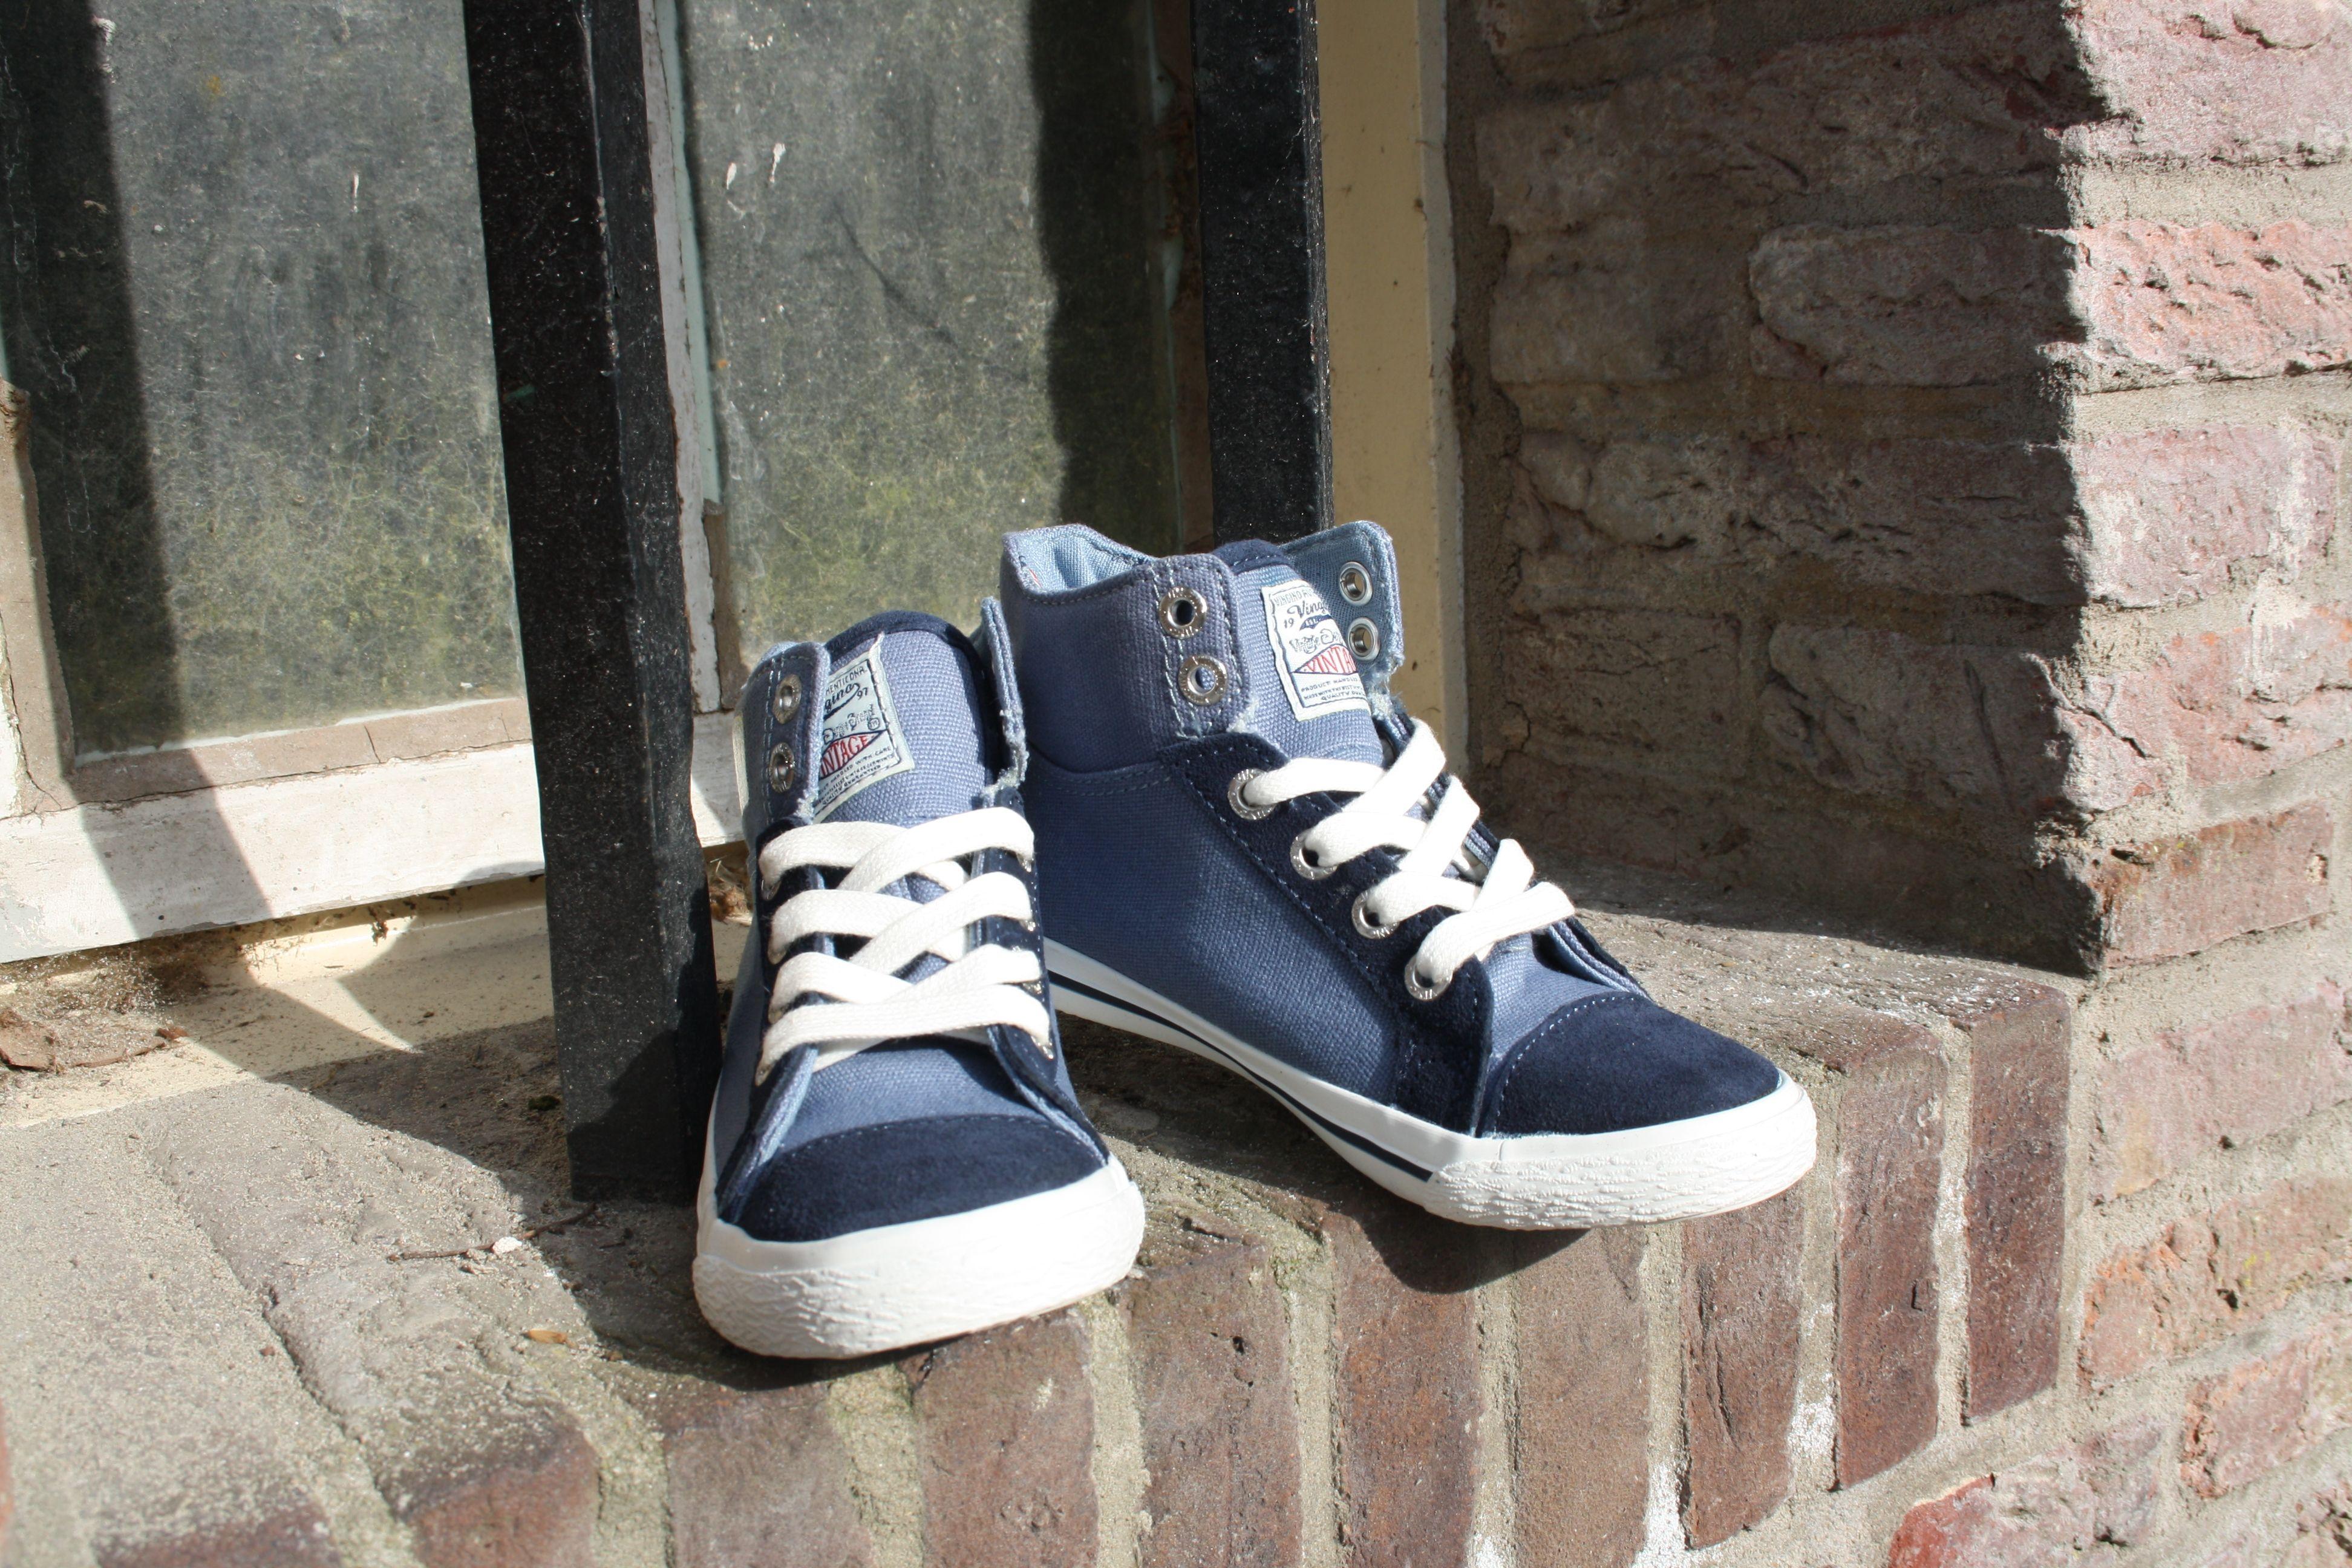 kidShoes outlet. VINGINO model Anthony  van €49,95 nu voor €24,95,-